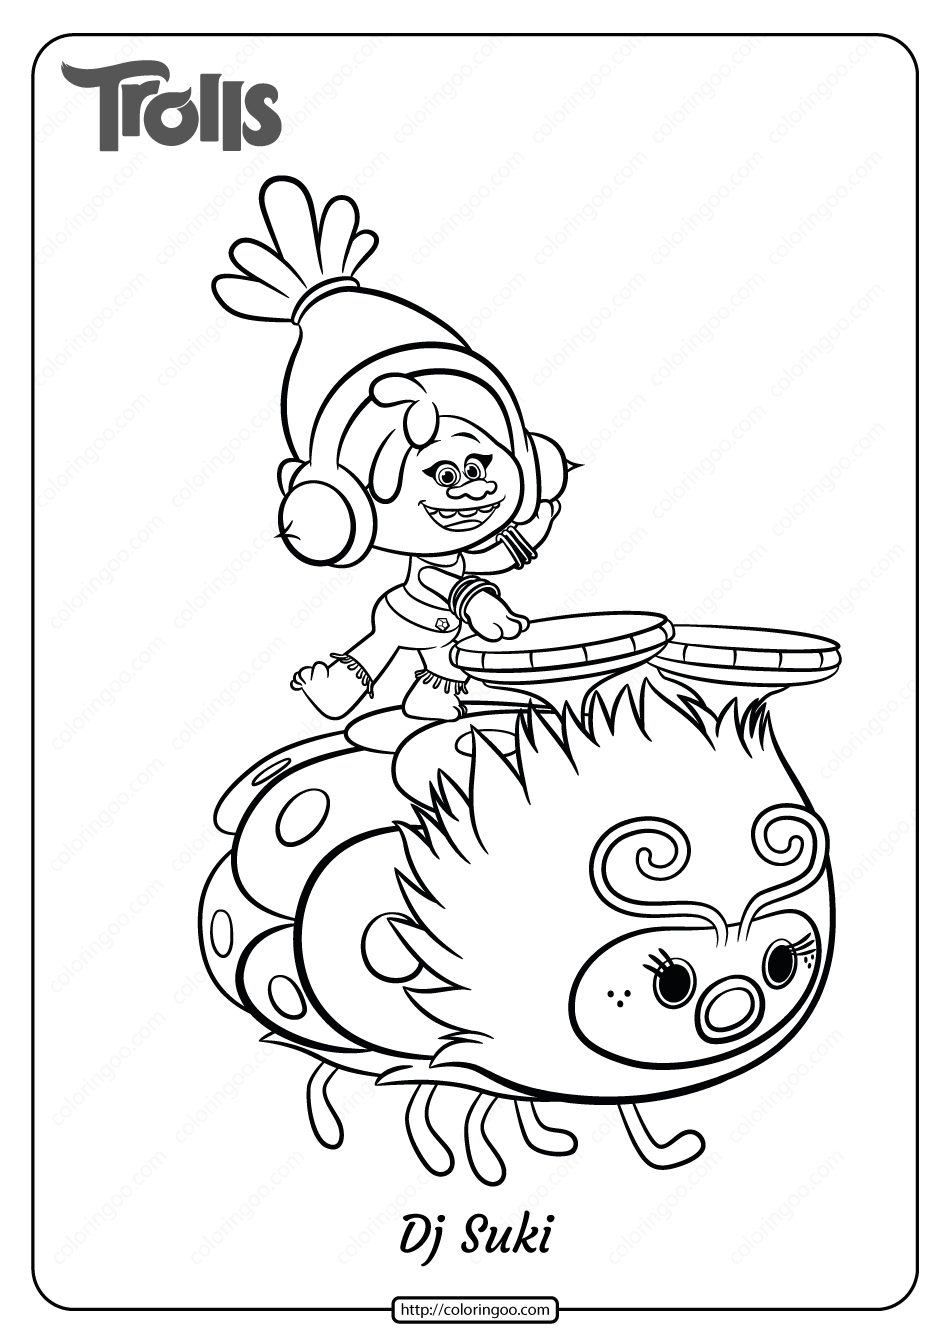 Free Printable Trolls Dj Suki Pdf Coloring Page 1